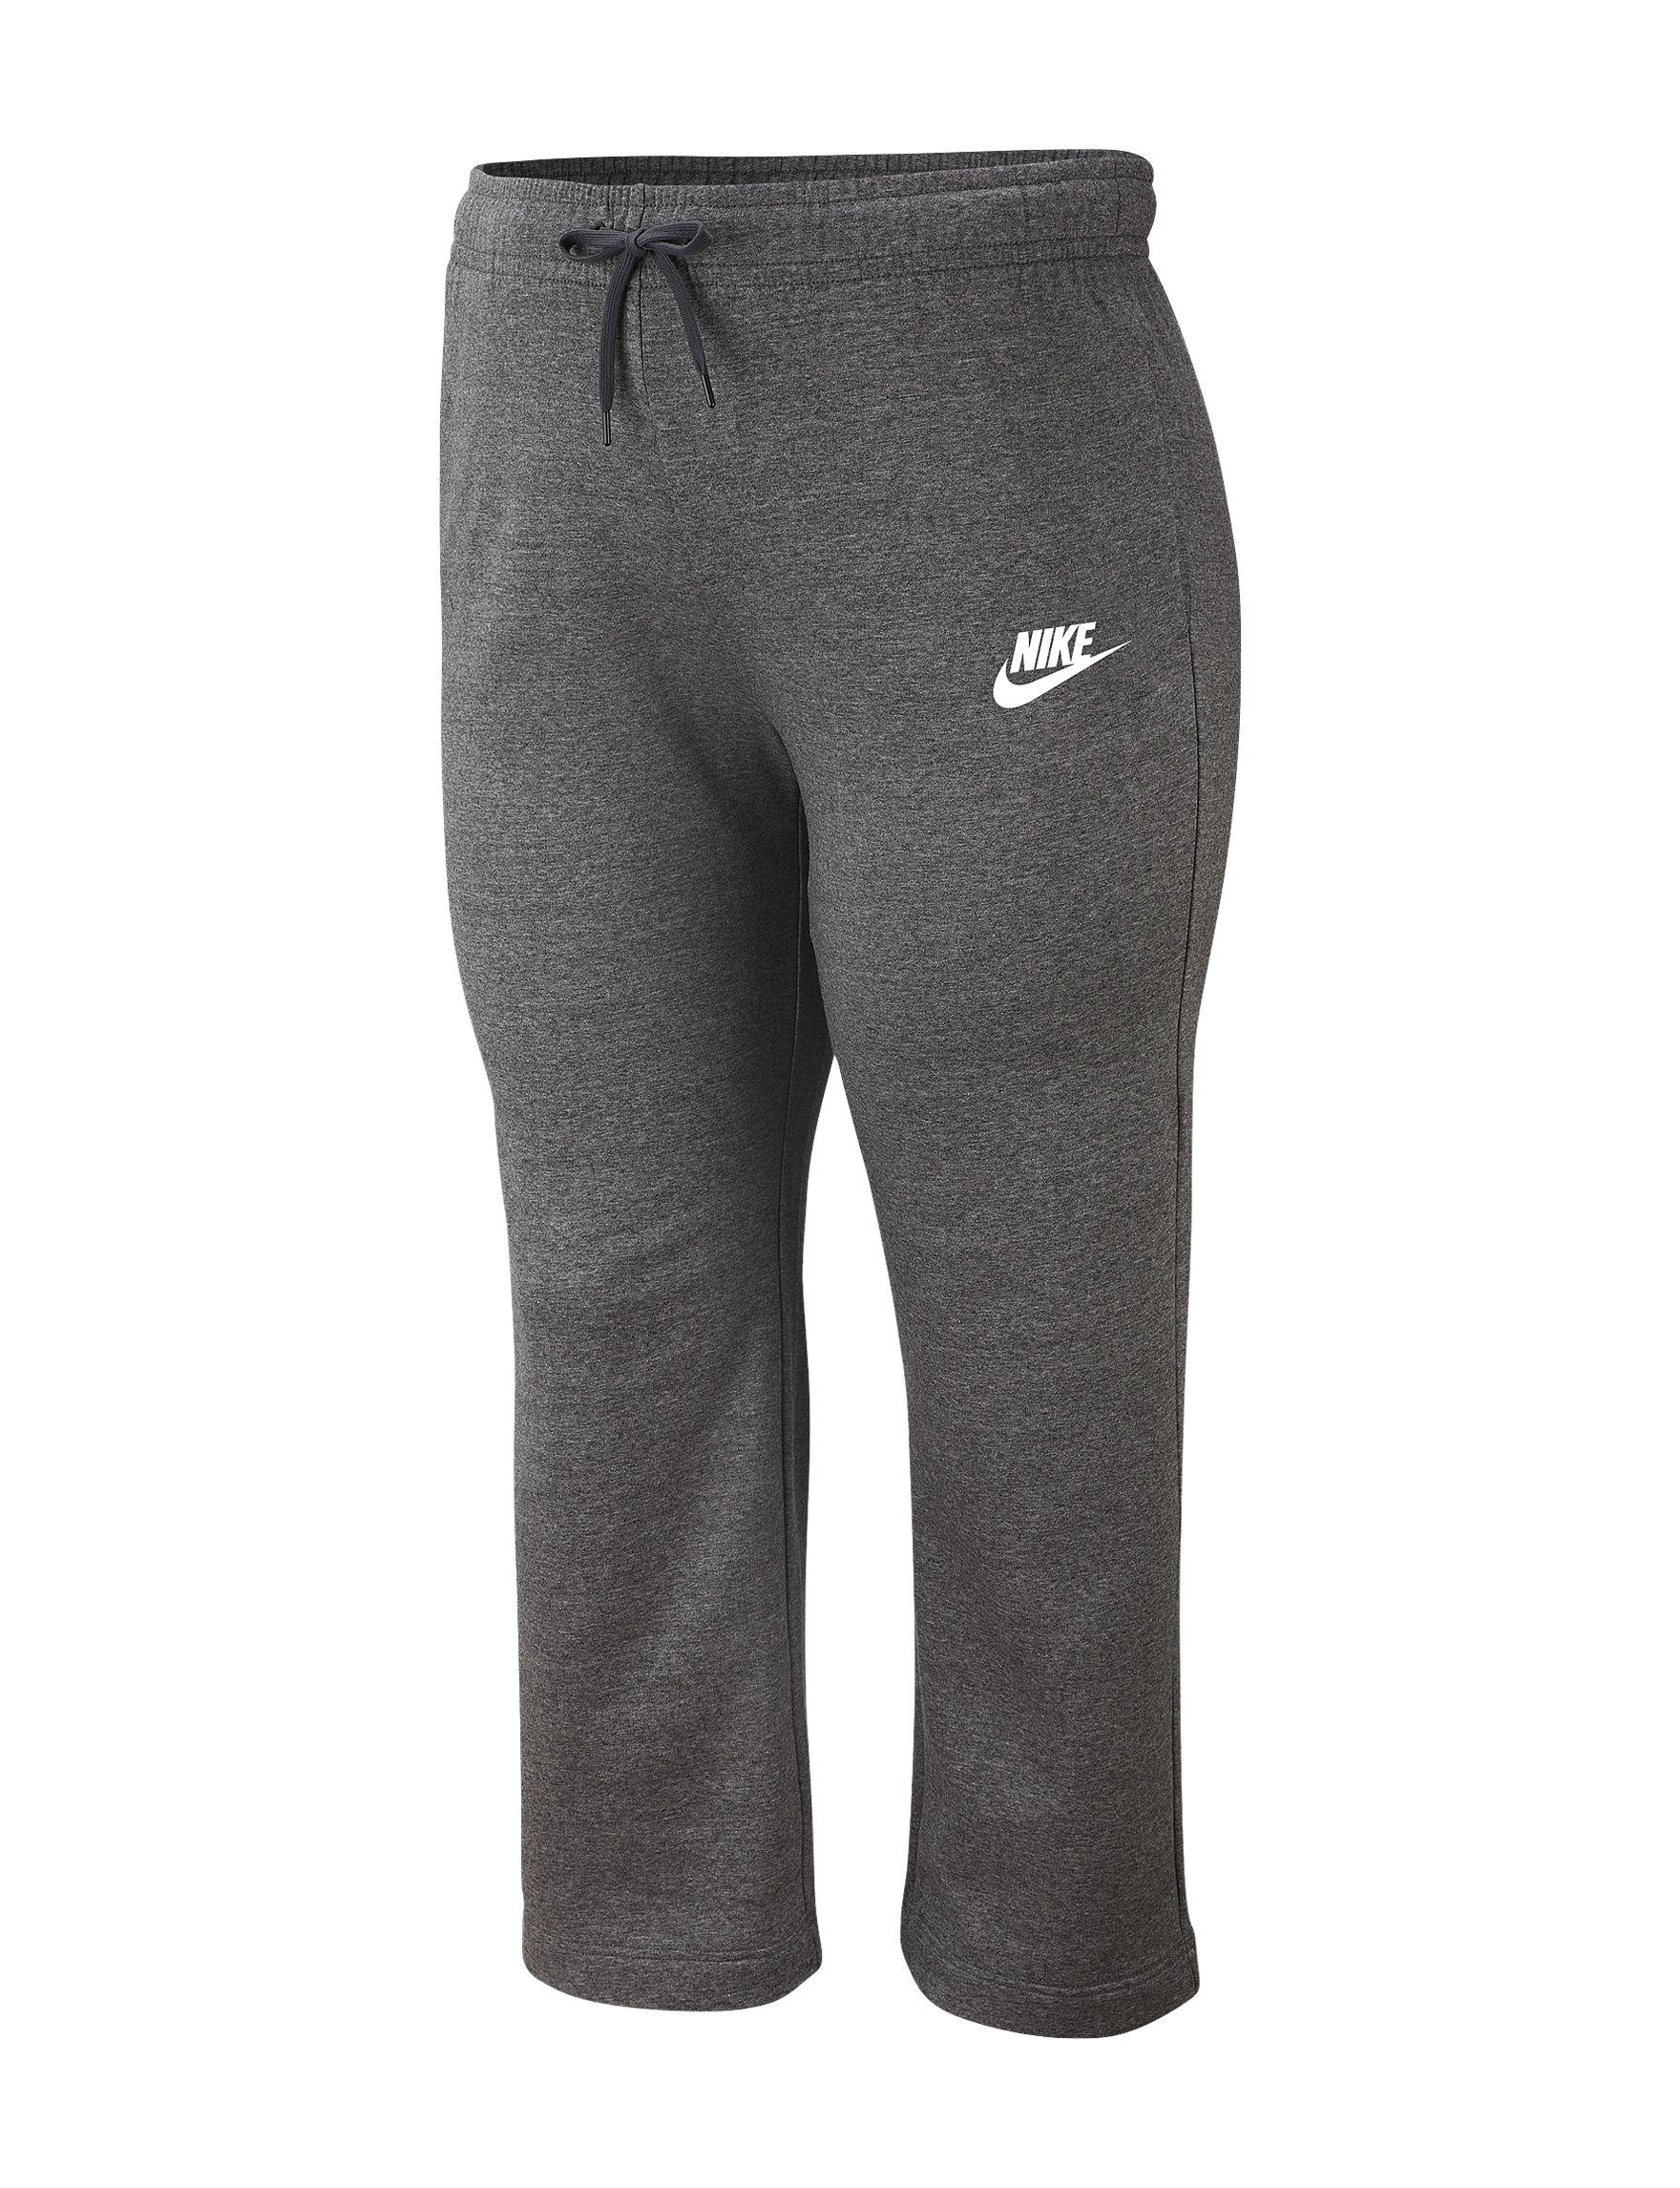 Nike Dark Heather Grey Active